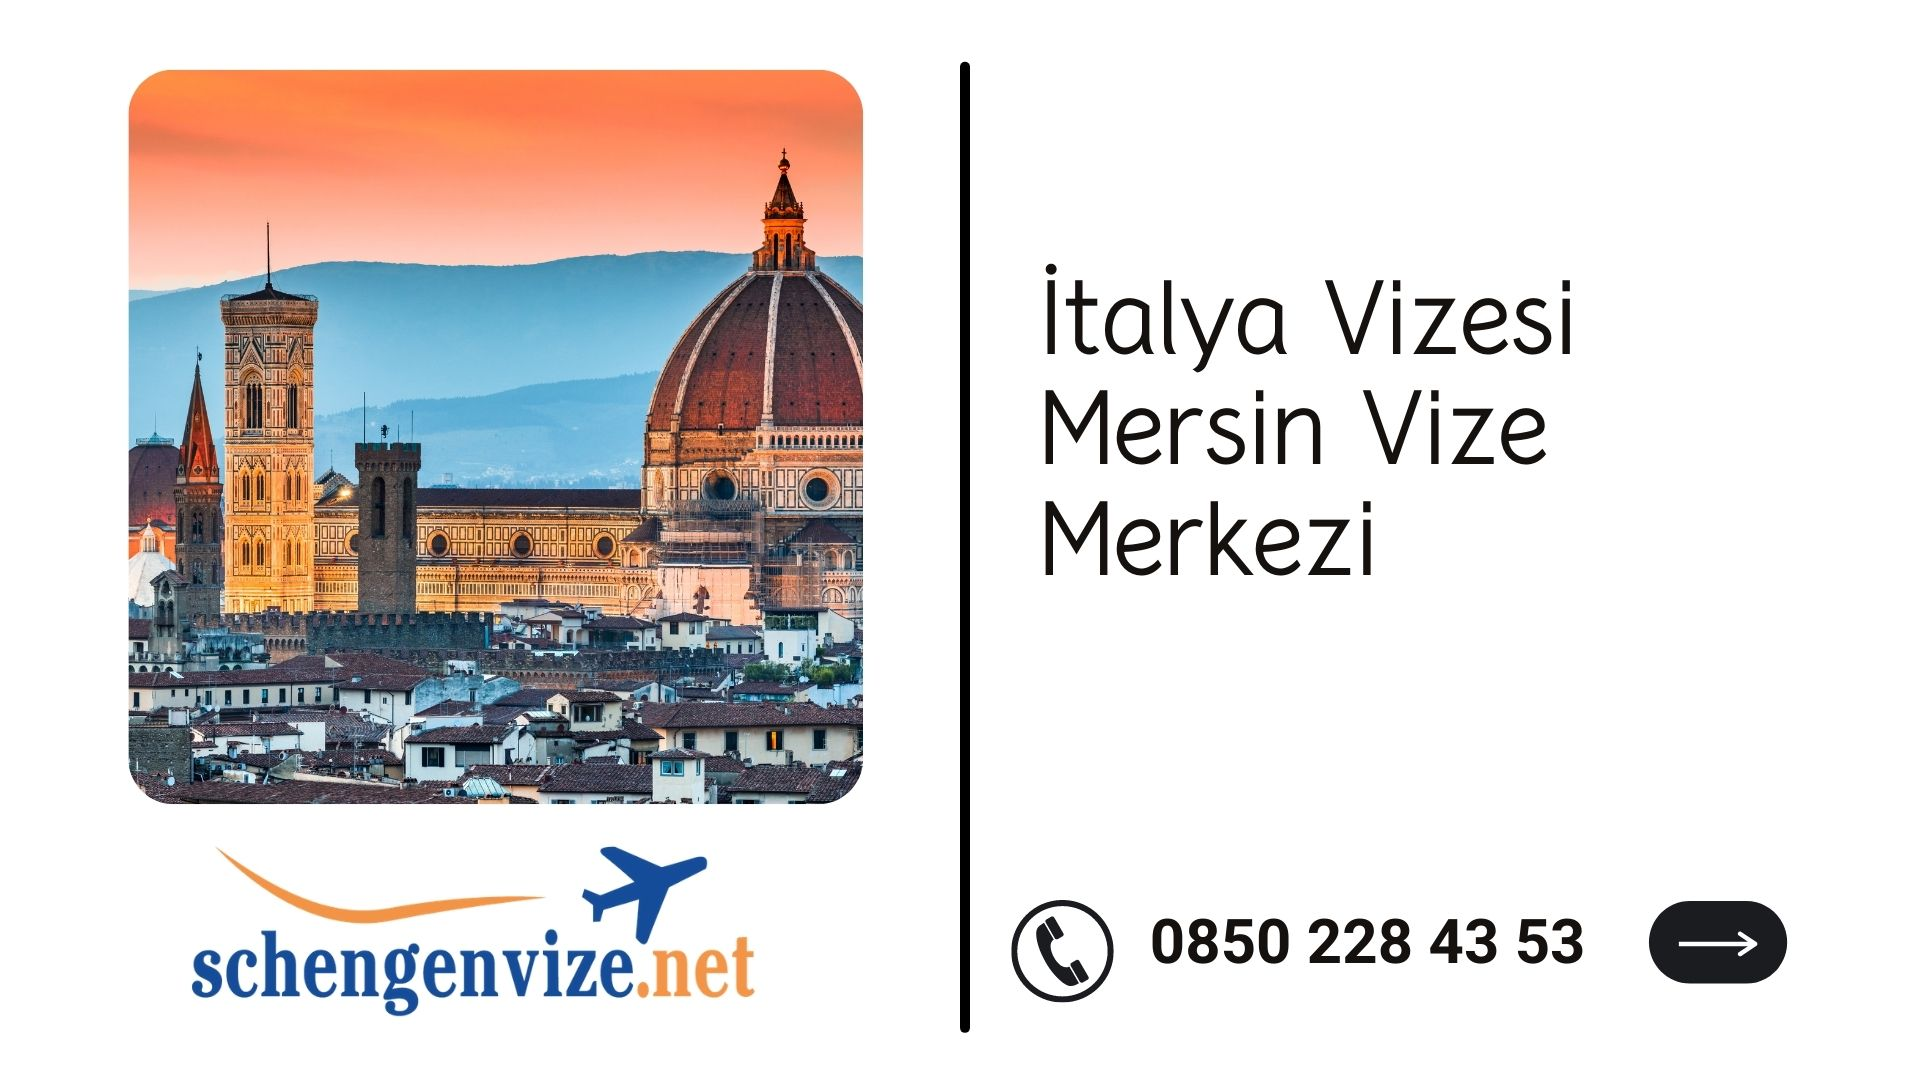 İtalya Vizesi Mersin Vize Merkezi